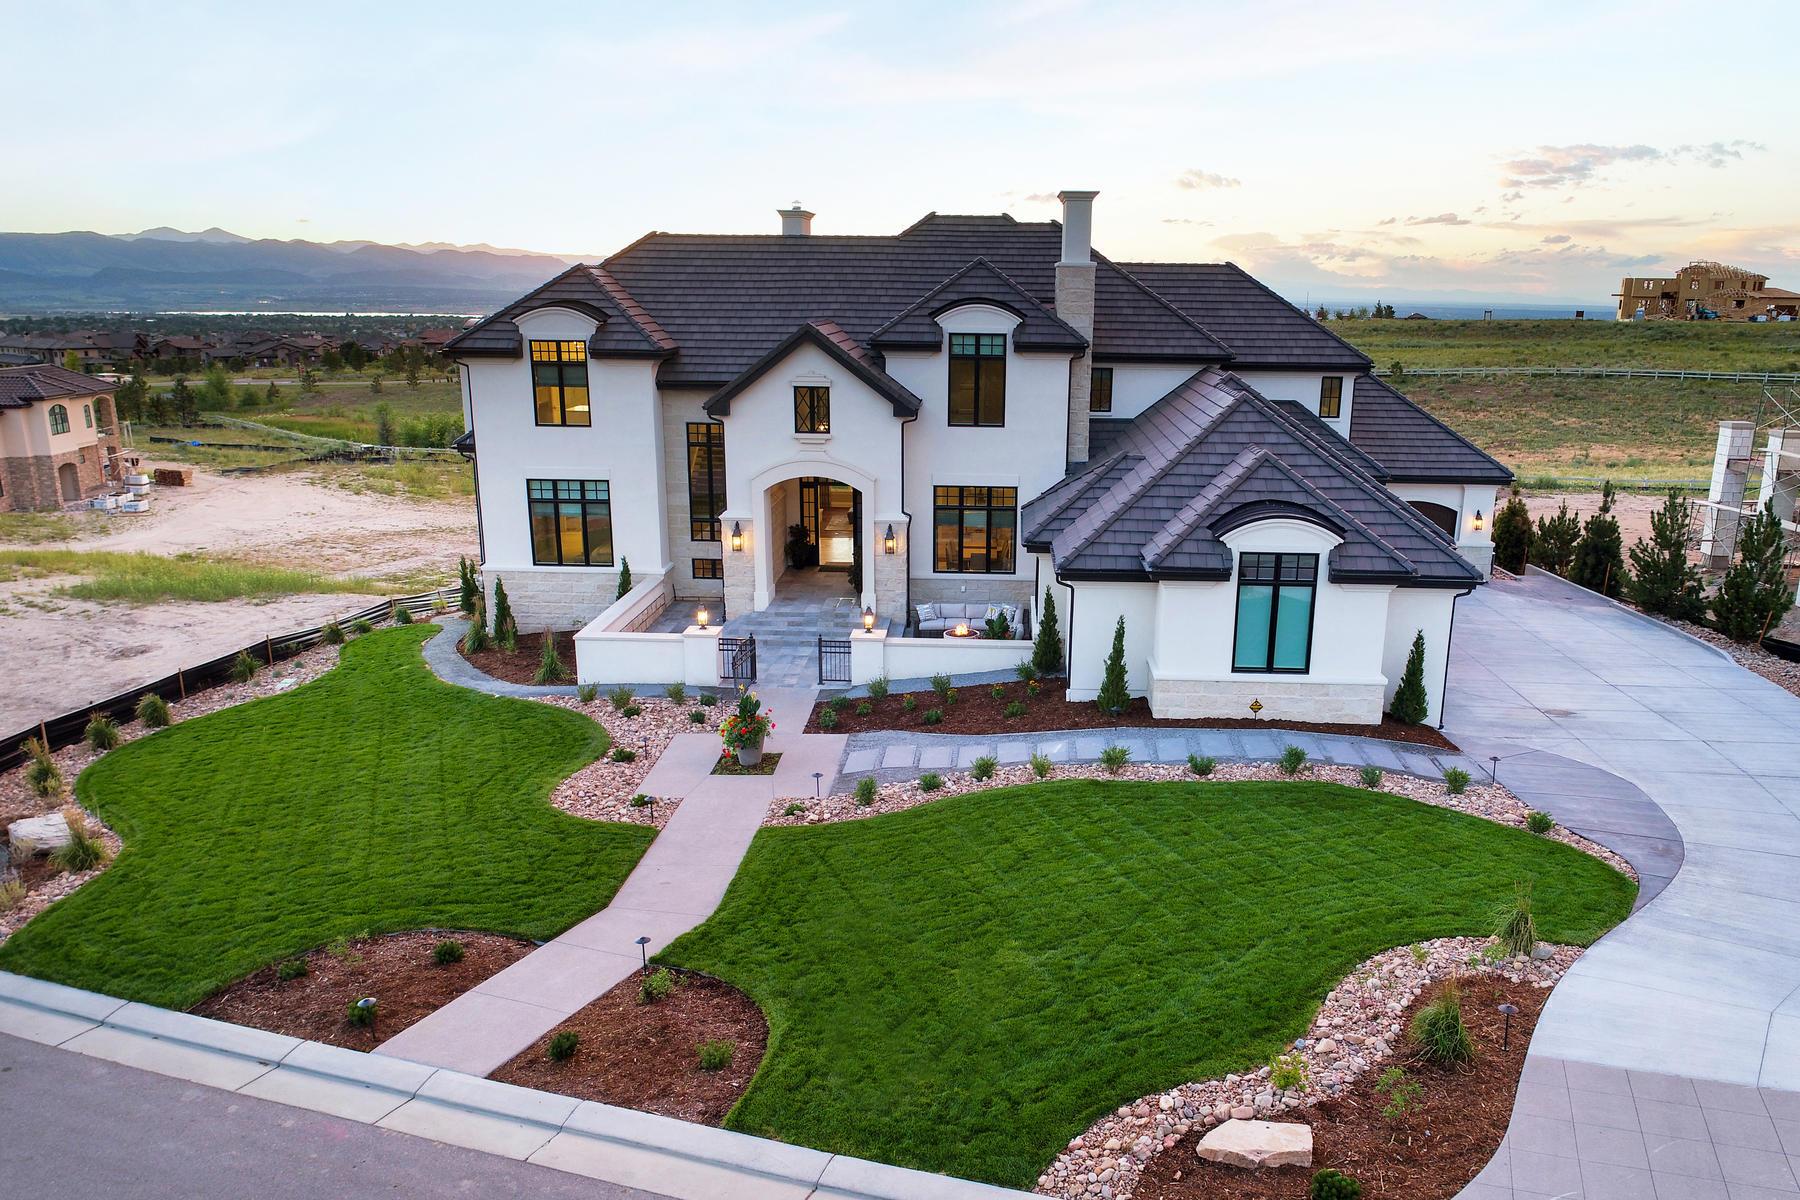 "Casa Unifamiliar por un Venta en Masterful design meets timeless finish and ""voila"" you have this exquisite home 10969 Skydance Dr Highlands Ranch, Colorado 80126 Estados Unidos"